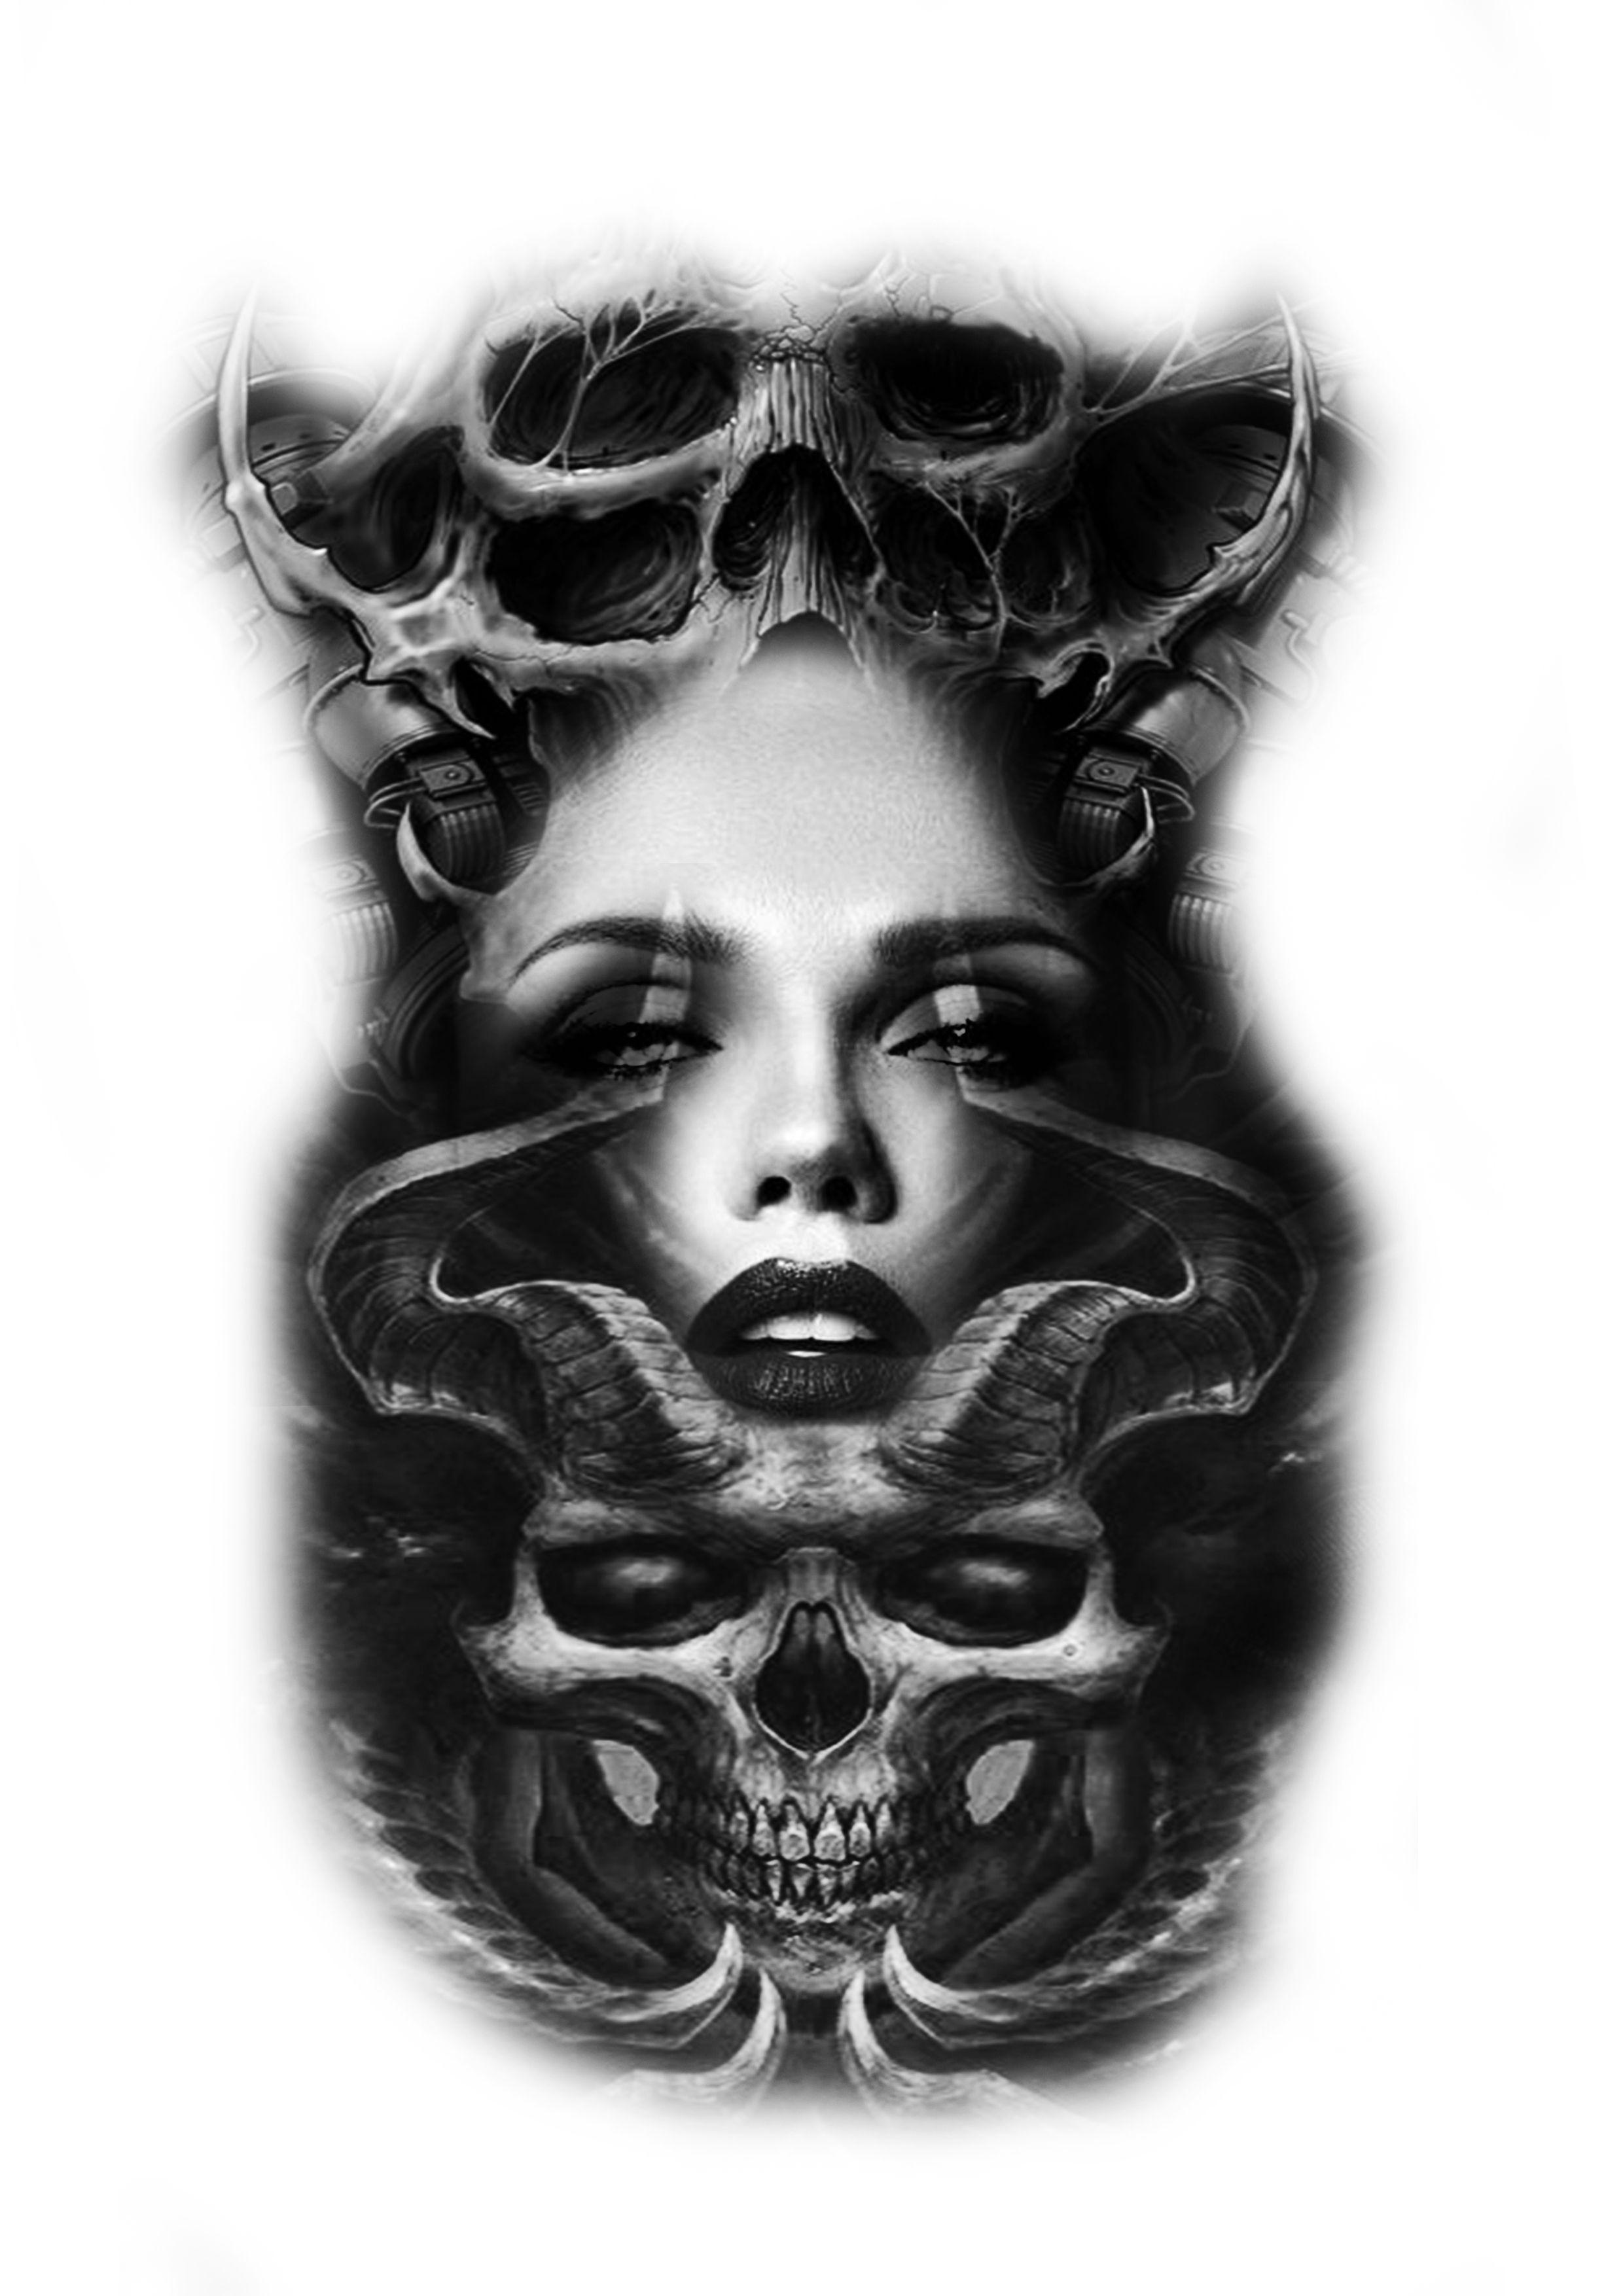 3b2f52da08bae biomech skulls morphs girls face tattoo design   photoshop tattoo ...